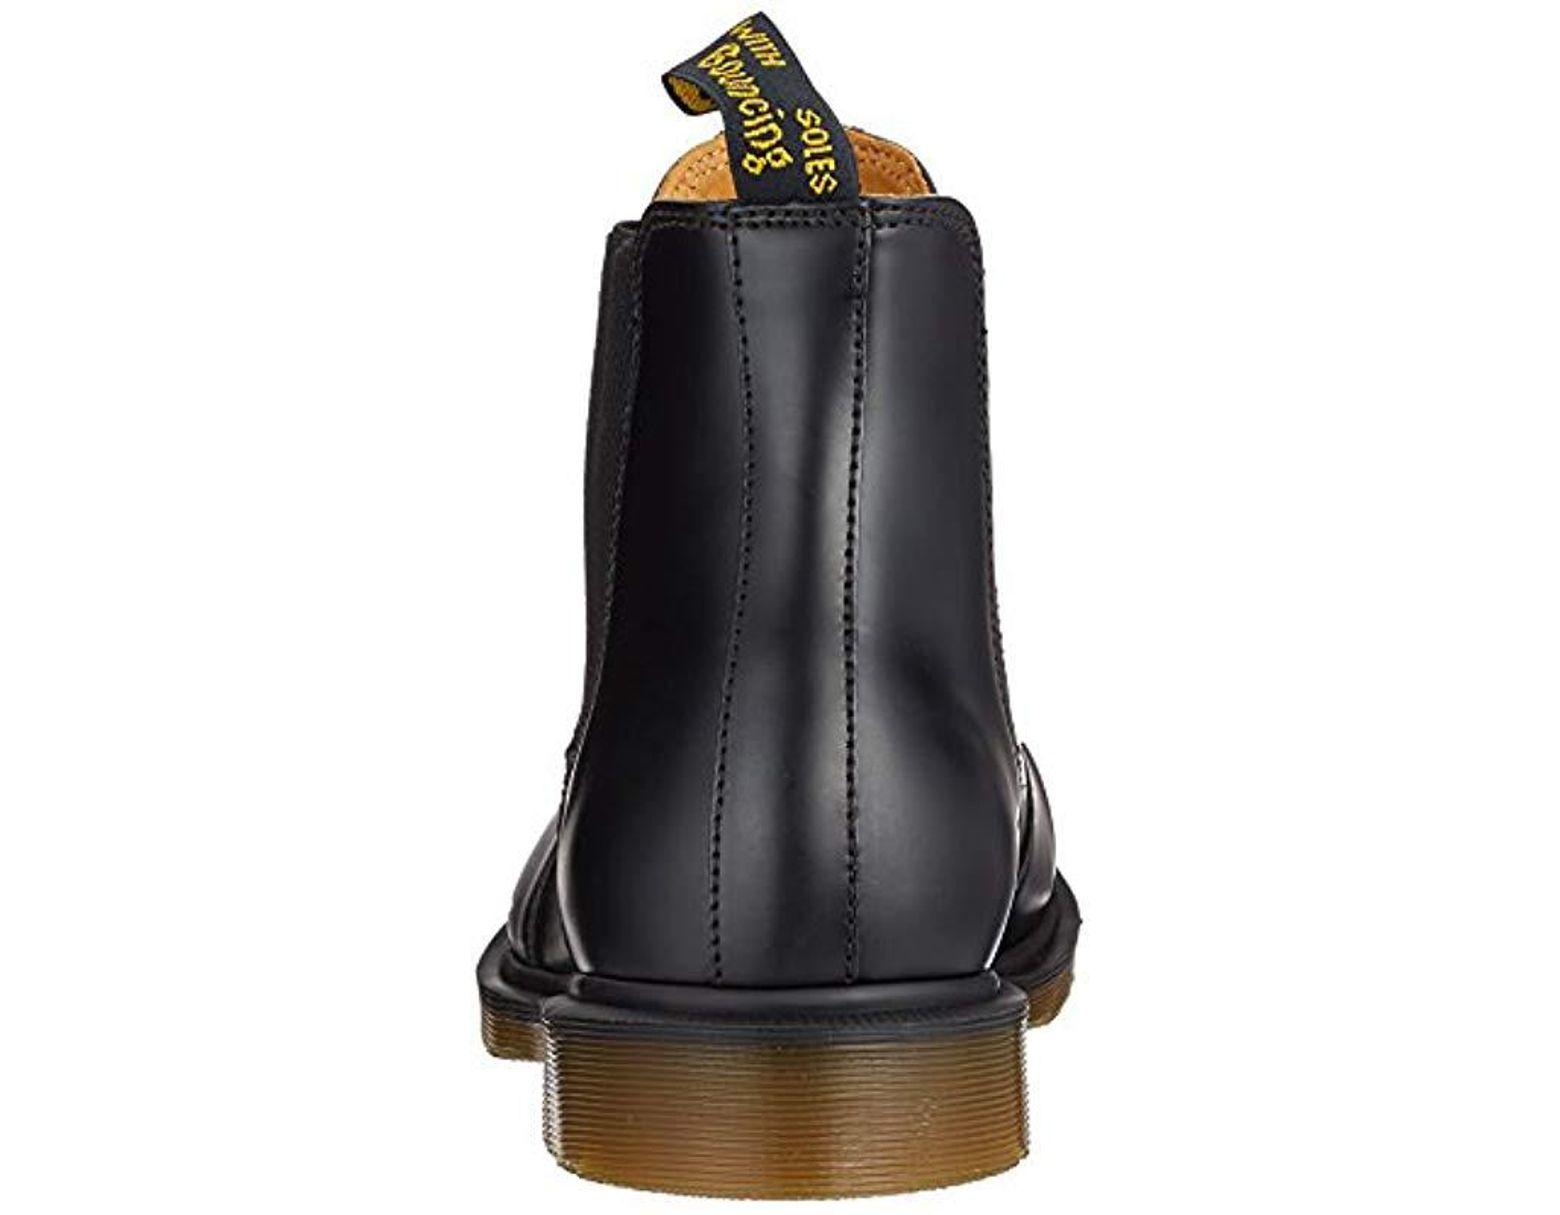 da43b11de Dr. Martens Dr. Marten's 2976 Original, Unisex-adults' Boots in Black for  Men - Save 11% - Lyst